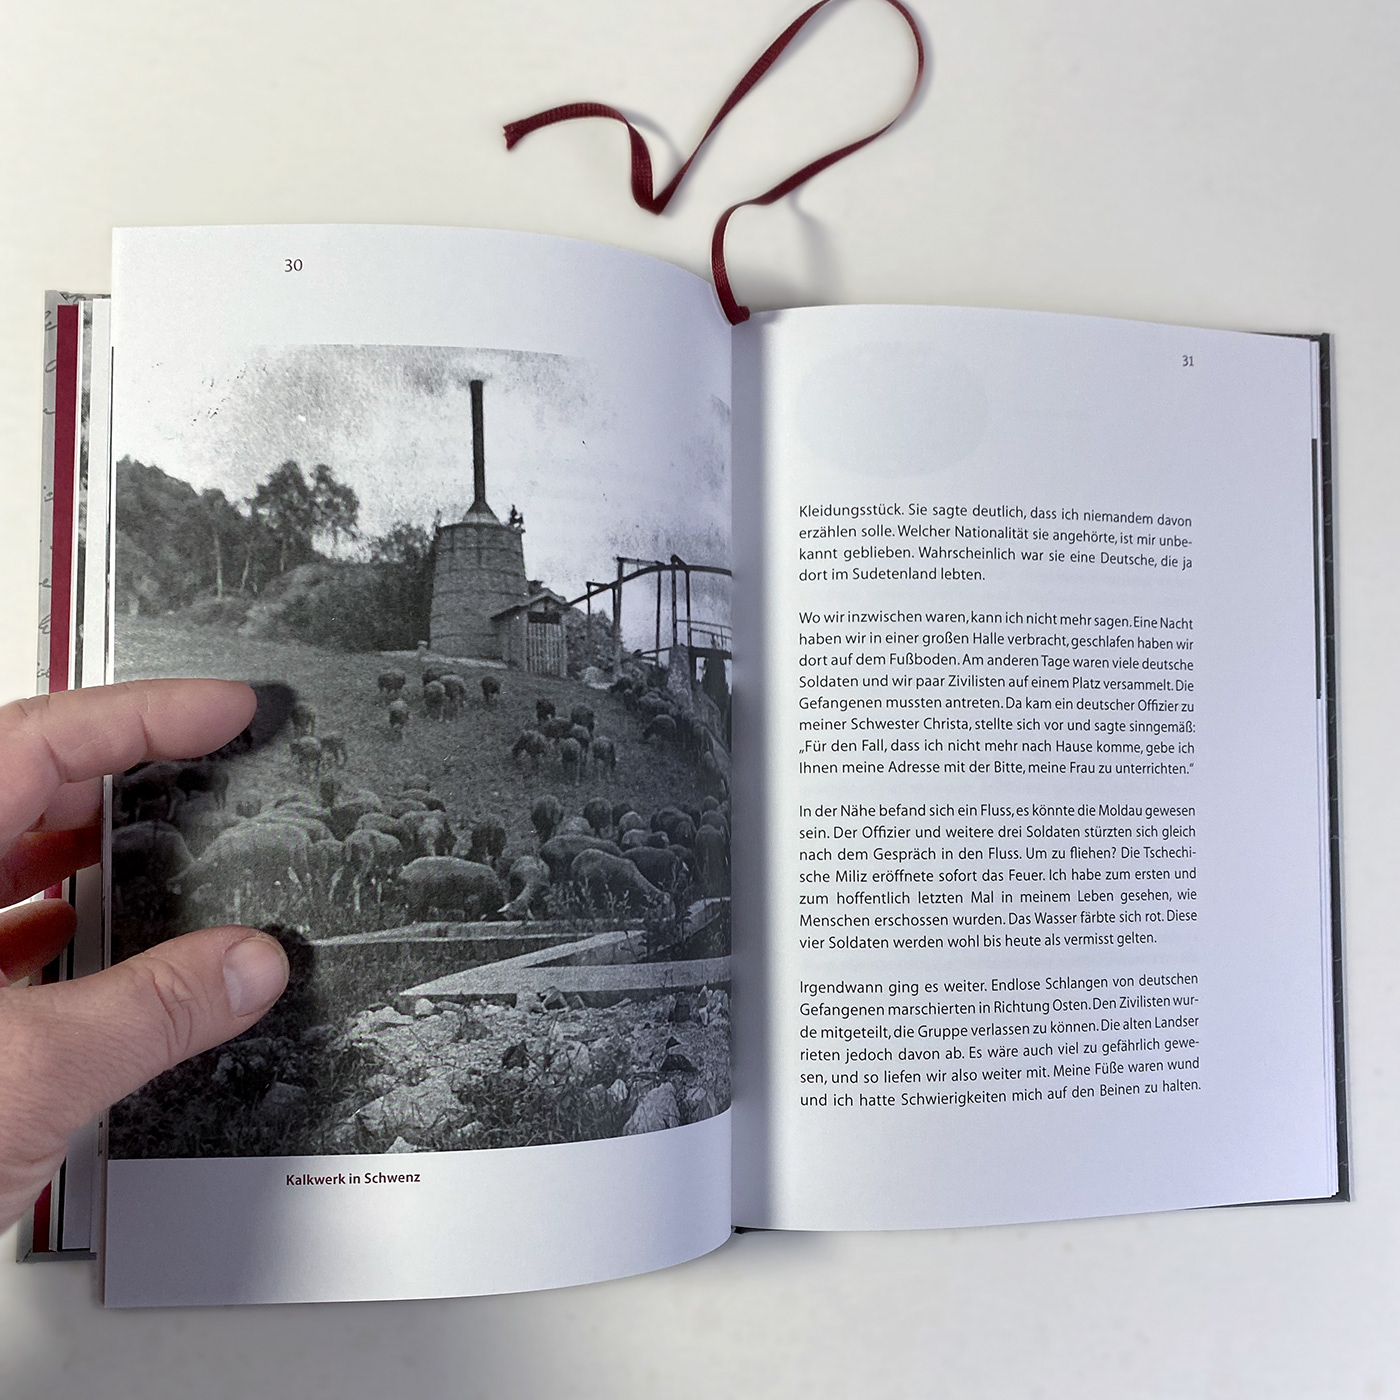 buch print design  book Book Binding Buchgestaltung cover culture editorial graphic design  history